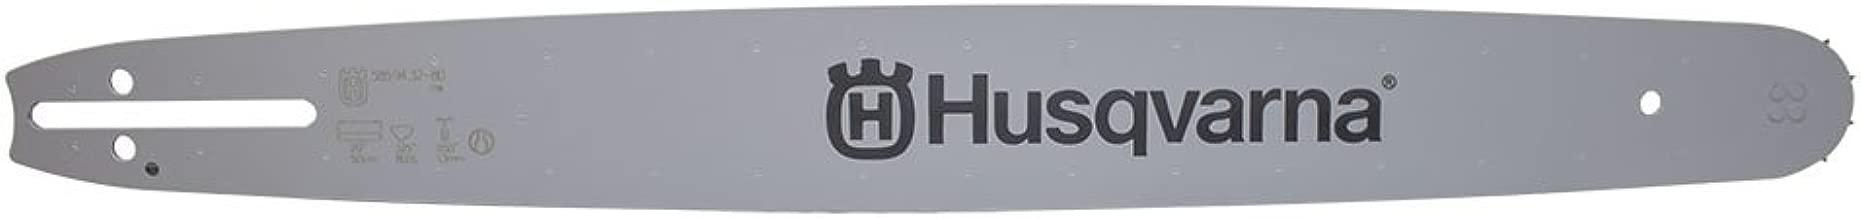 Husqvarna OEM 585943280 / 20